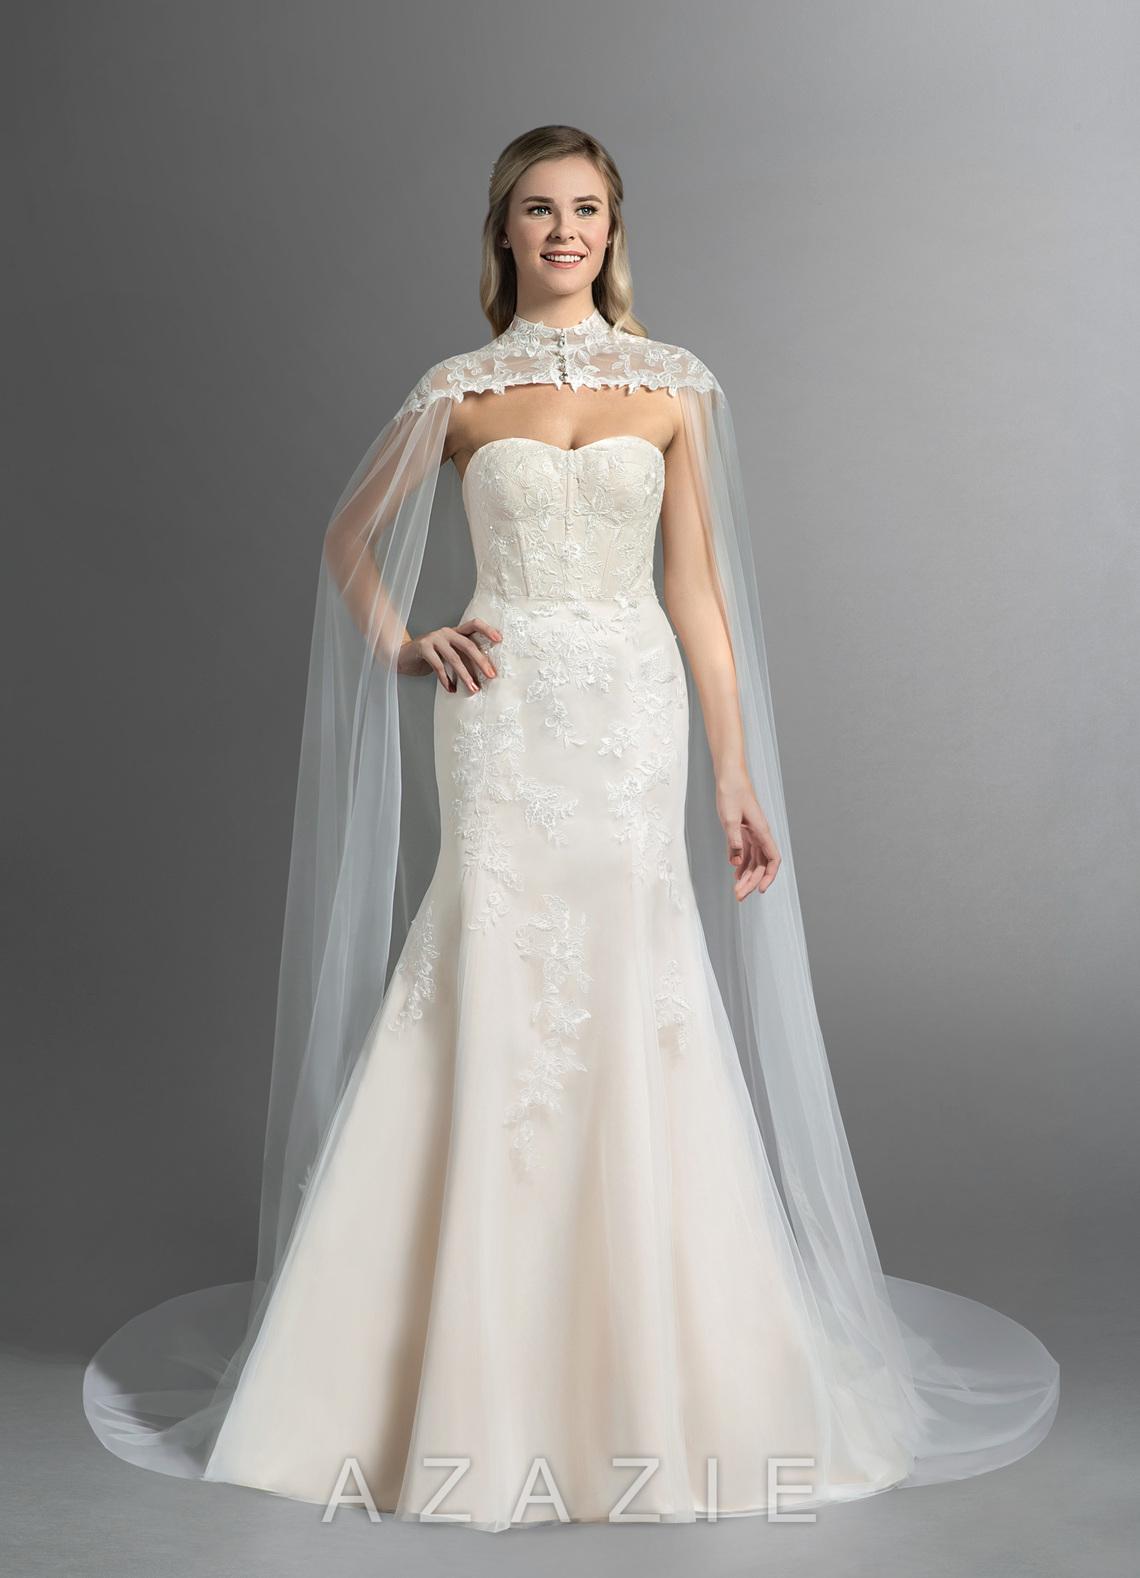 94871e803a09 Azazie Guadalupe BG Wedding Dress | Azazie